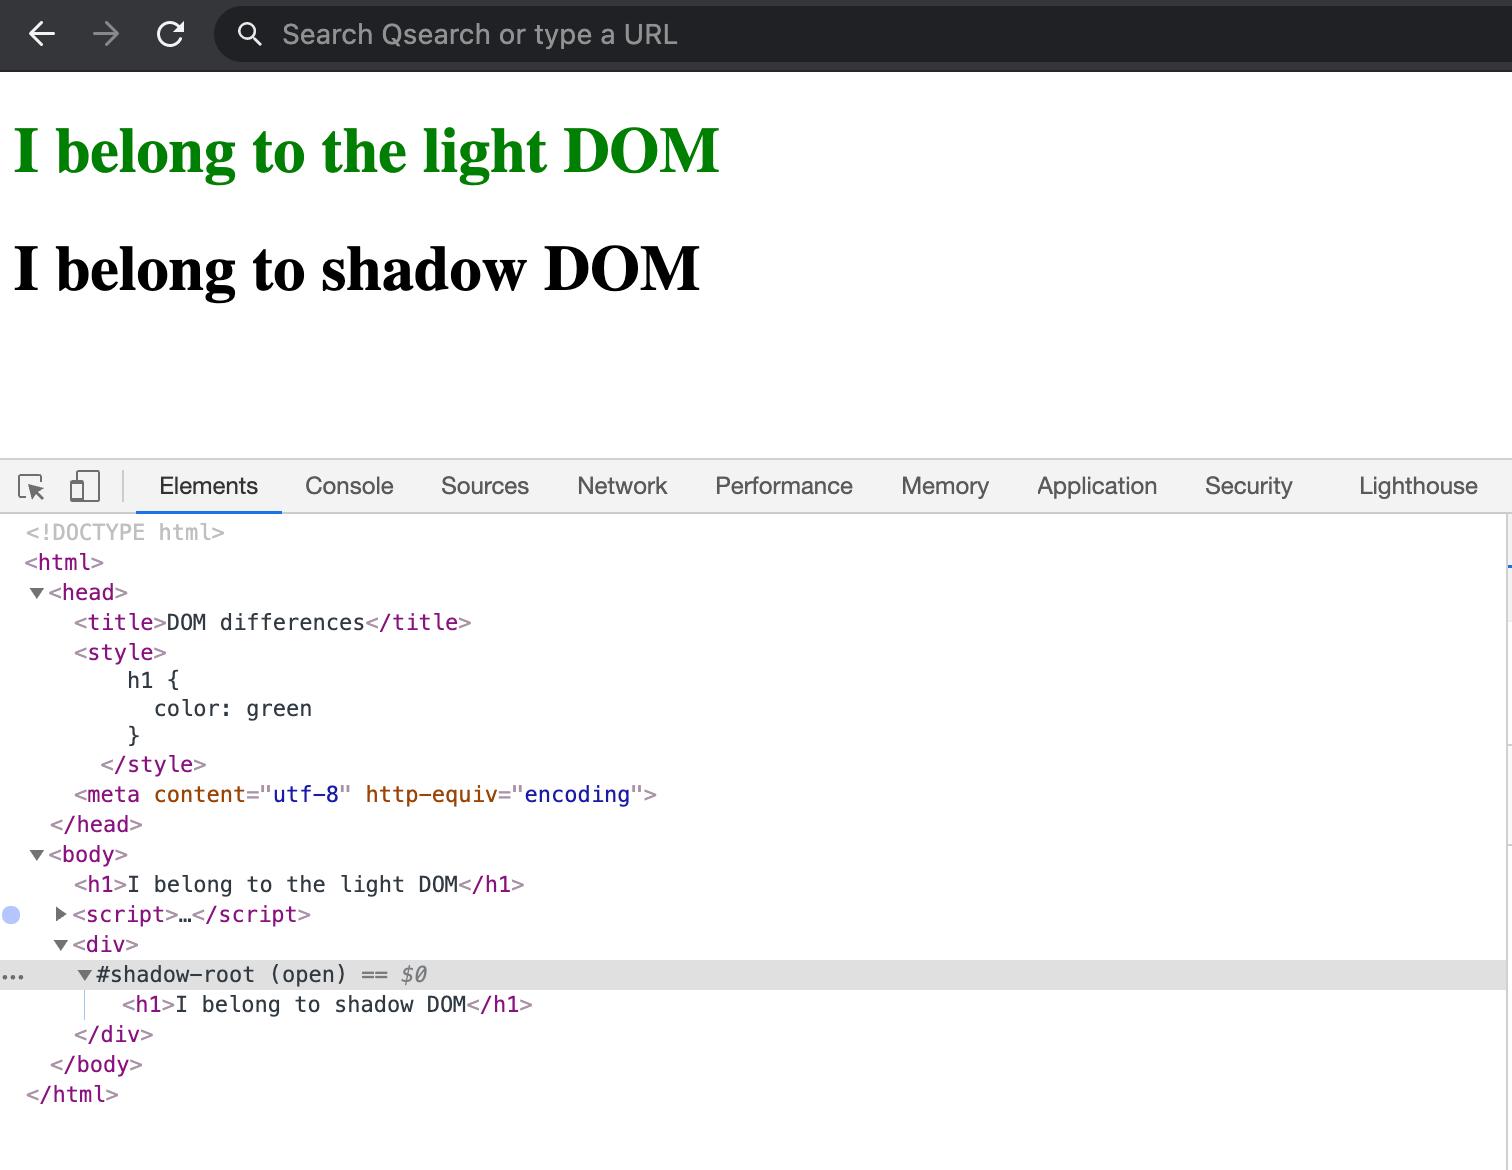 I belong to the light DOM